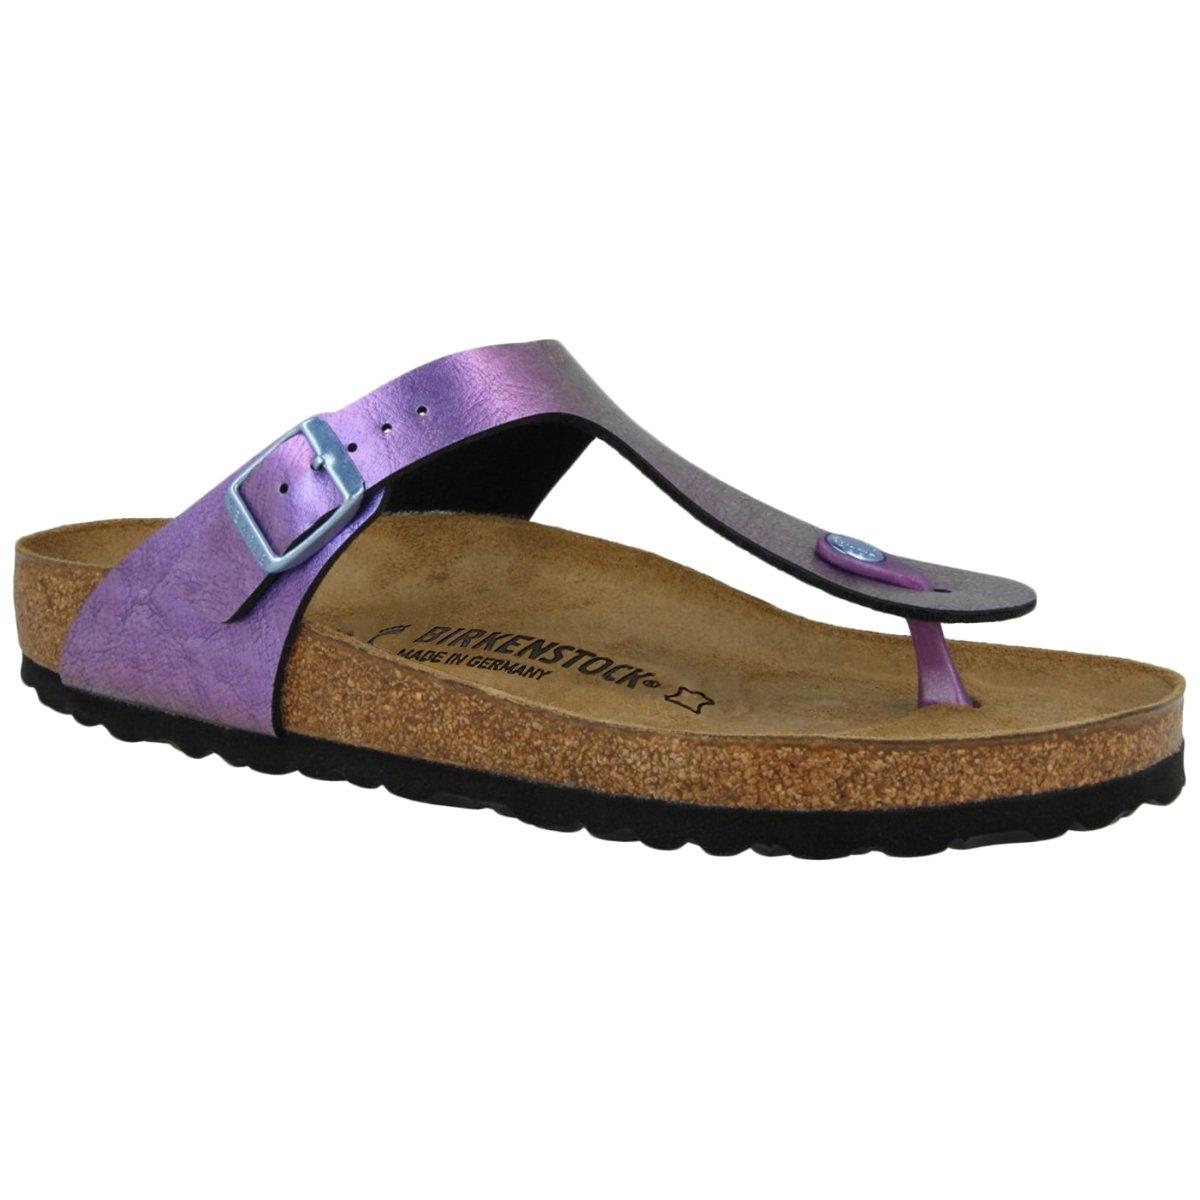 9ee4a4c26fb Galleon - Birkenstock Unisex Gizeh Birko-Flor Graceful GEMM Violet Sandals  6 W   4 M US